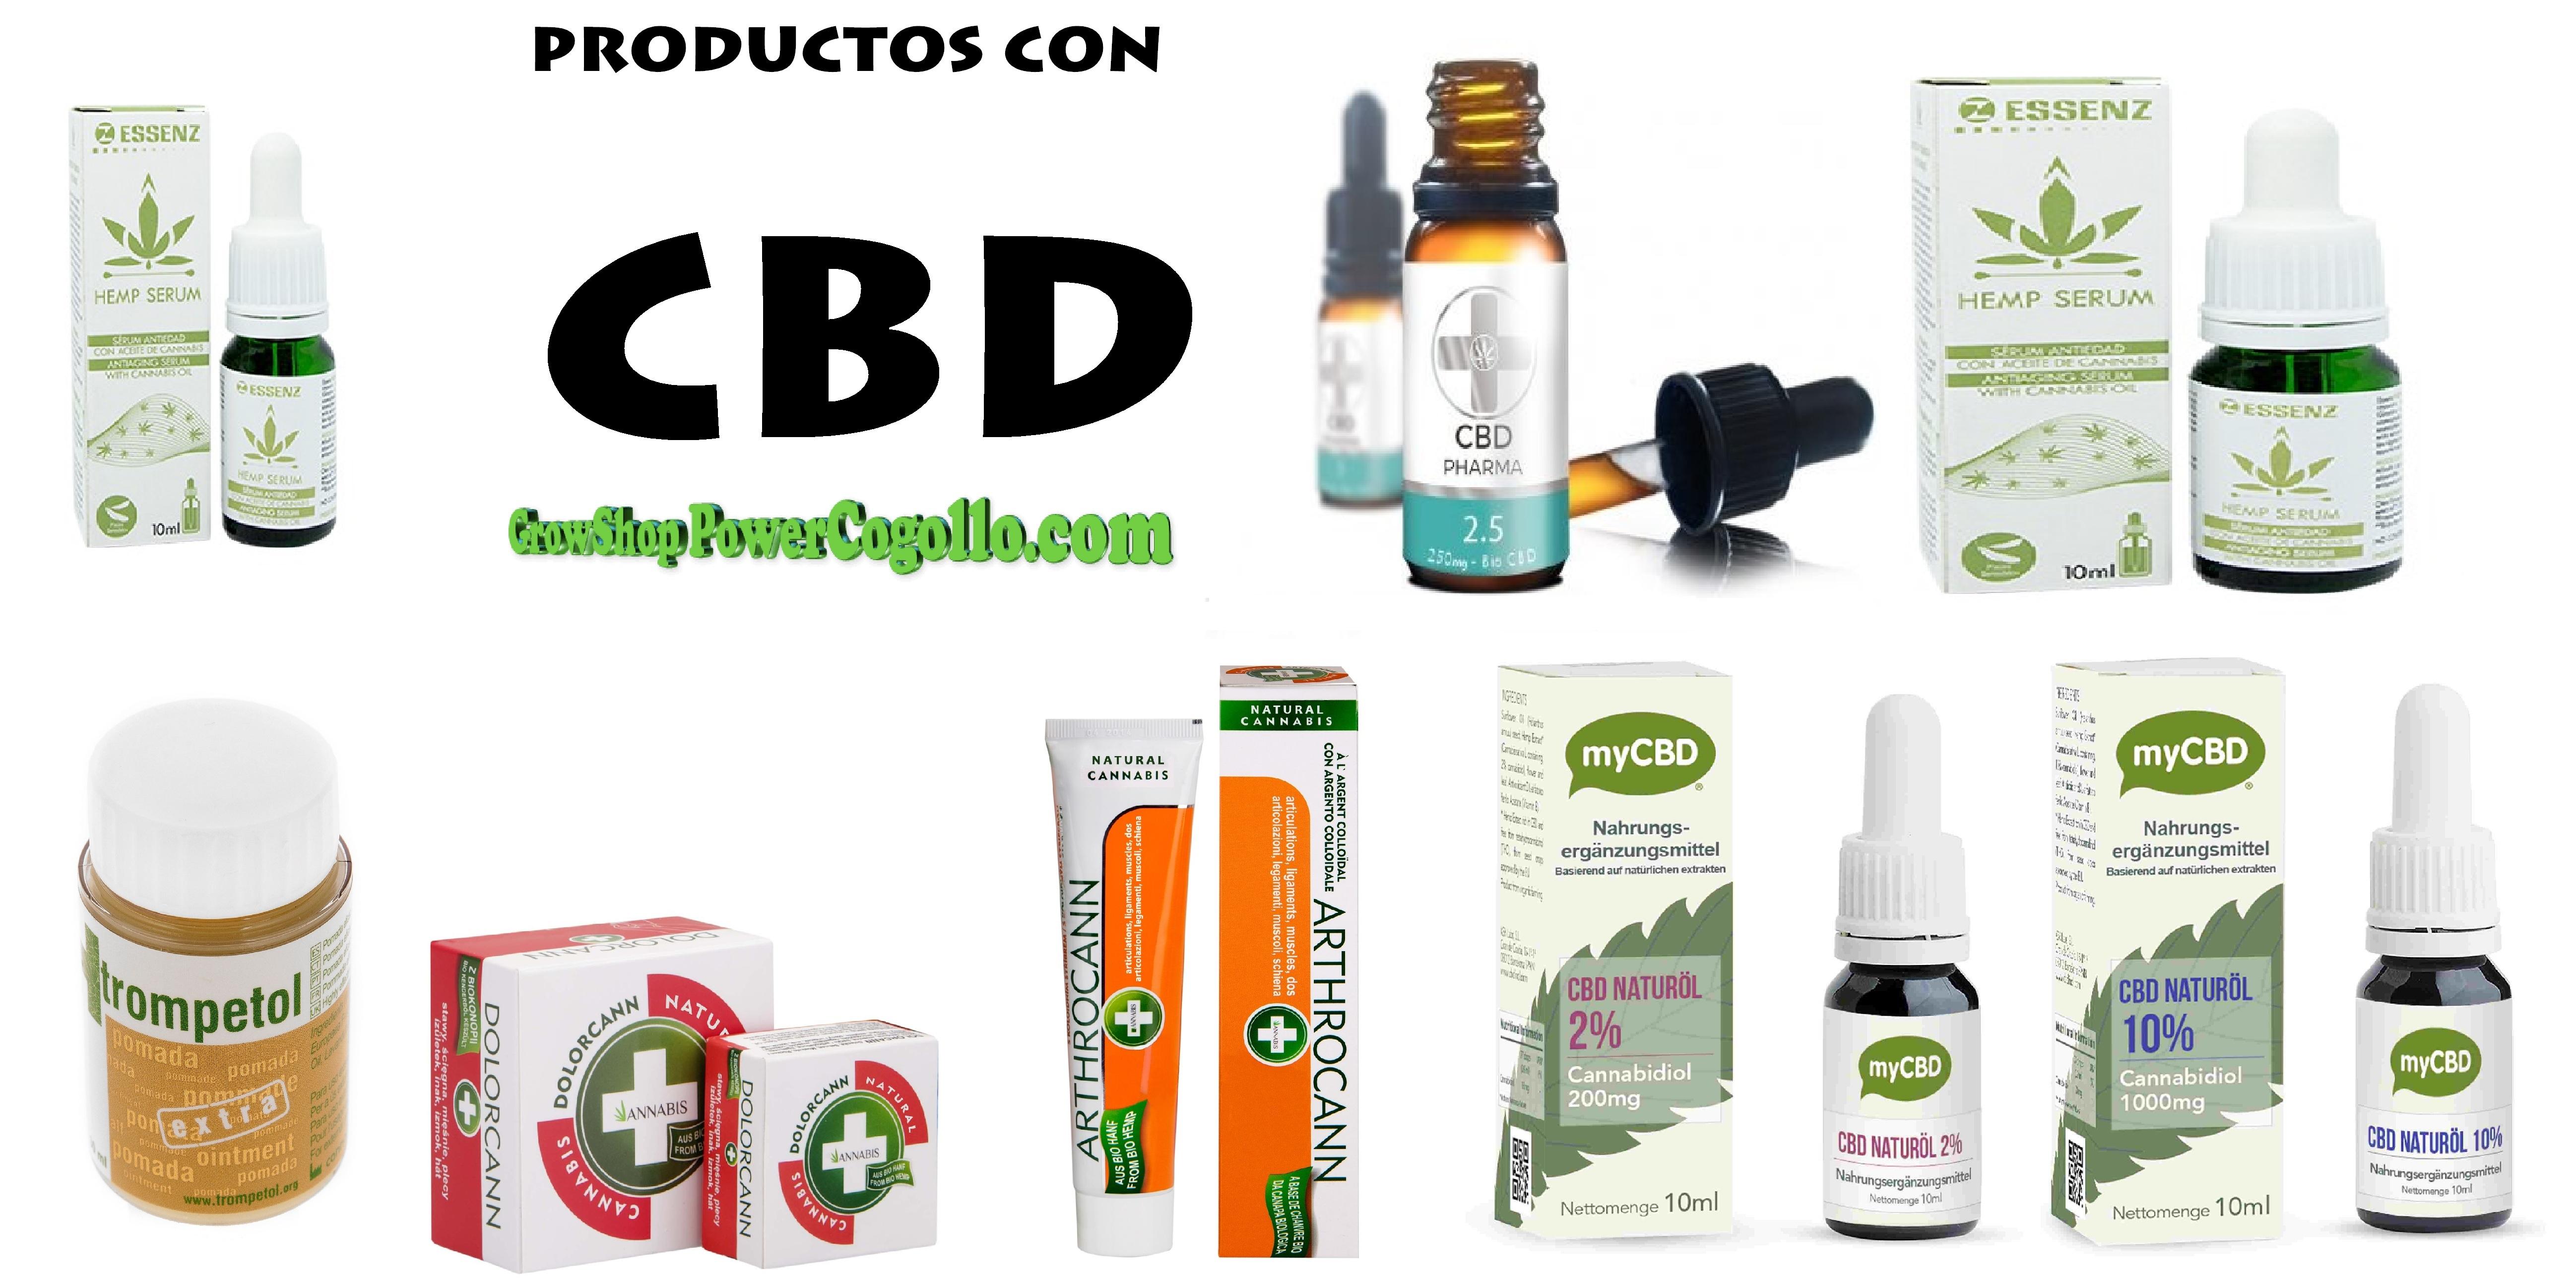 Productos de Cannabis con CBD